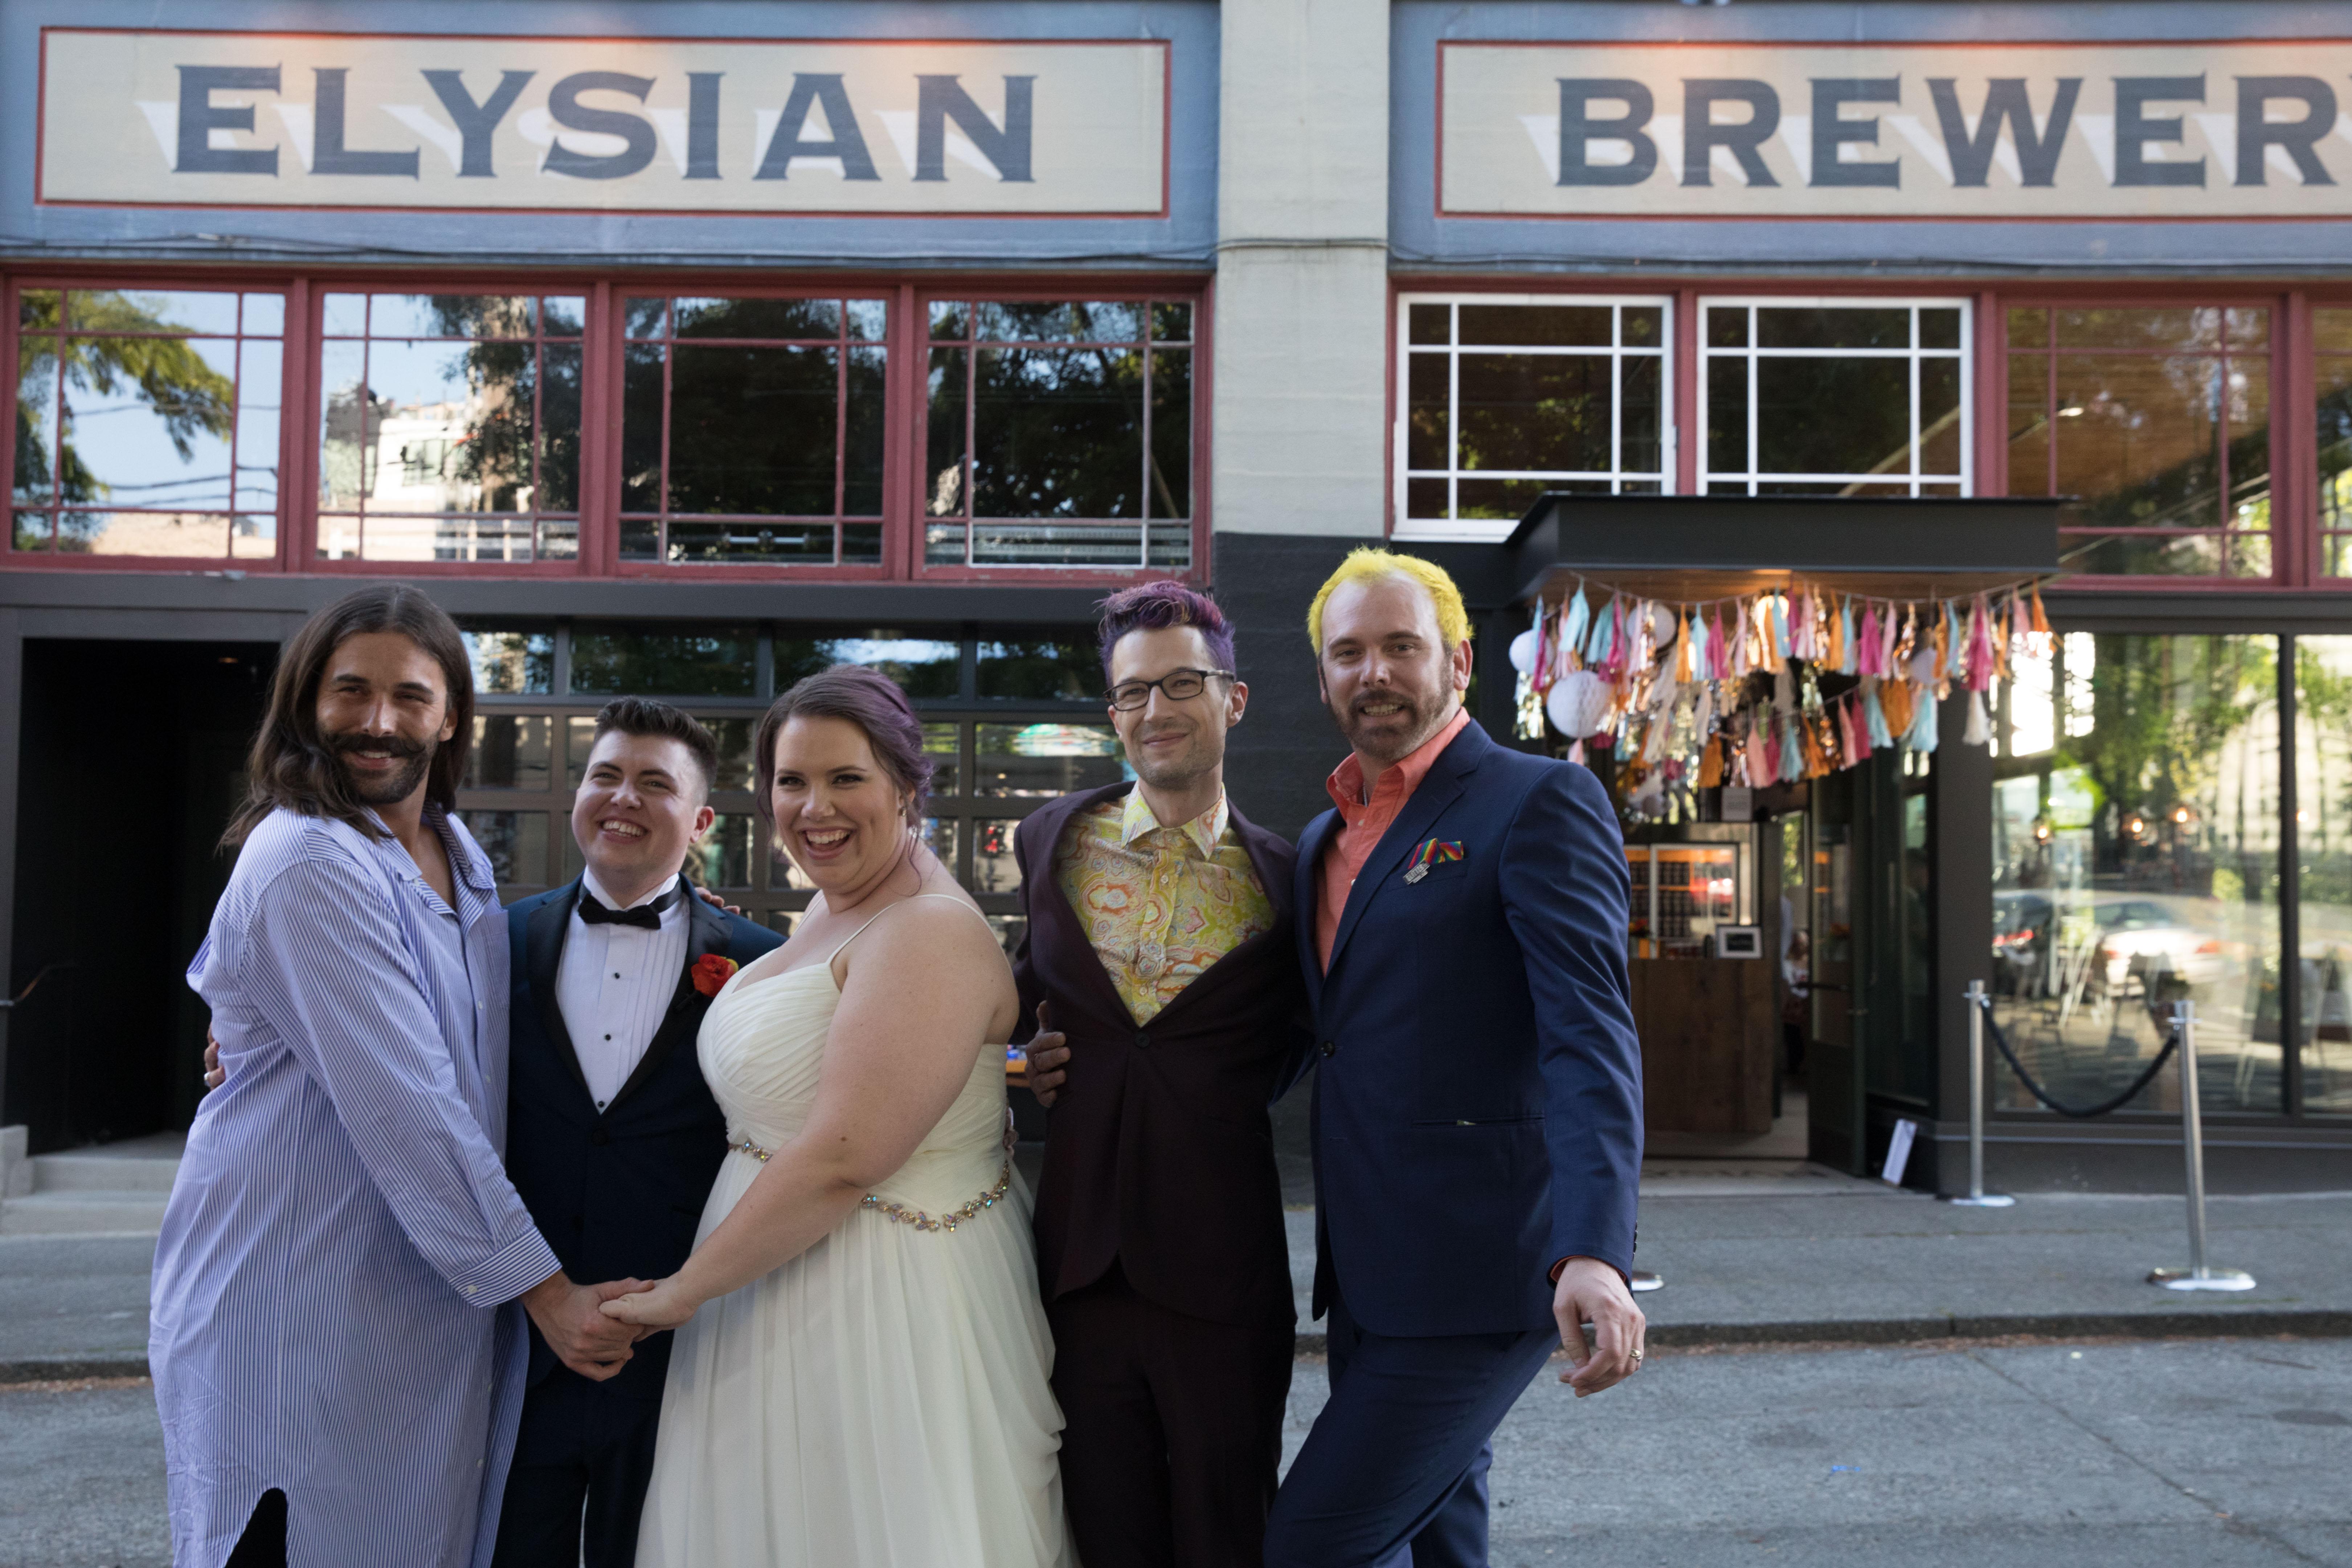 Jonathan Van Ness Officiates Wedding for Couple With Sweet Backstory